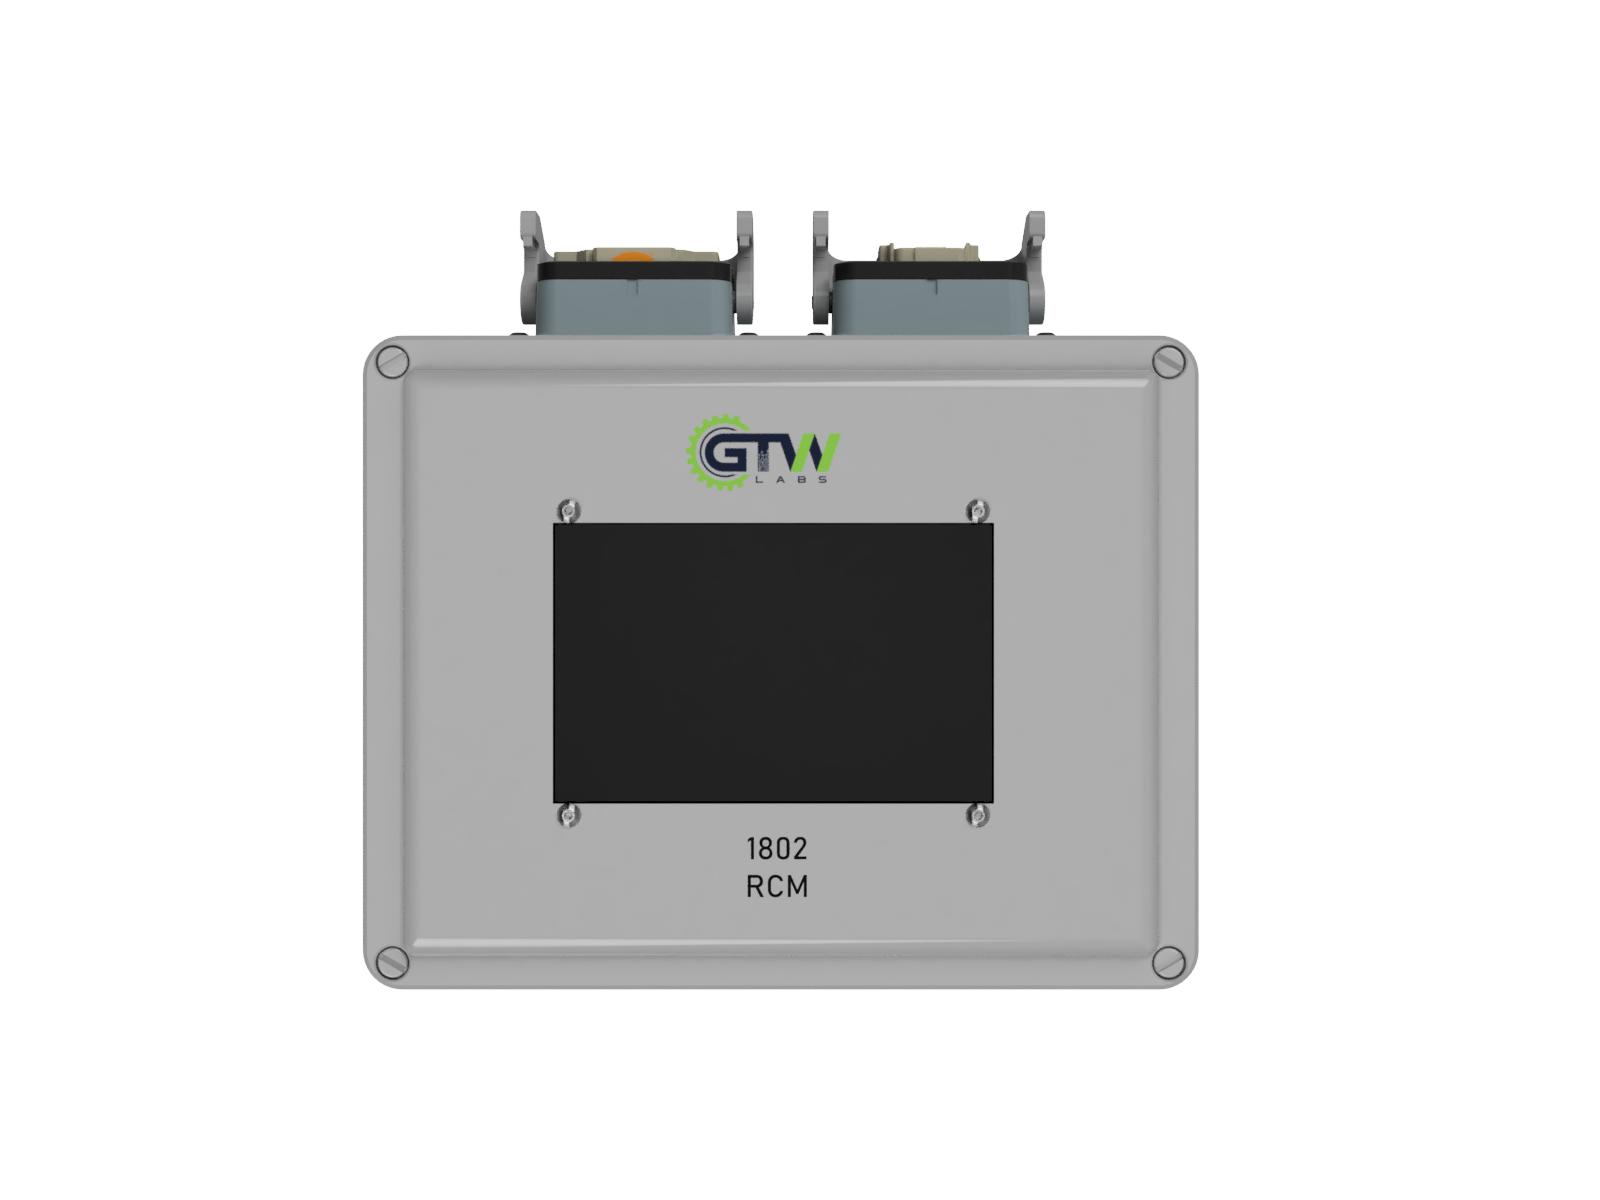 RCM - Remote Calibrate Module